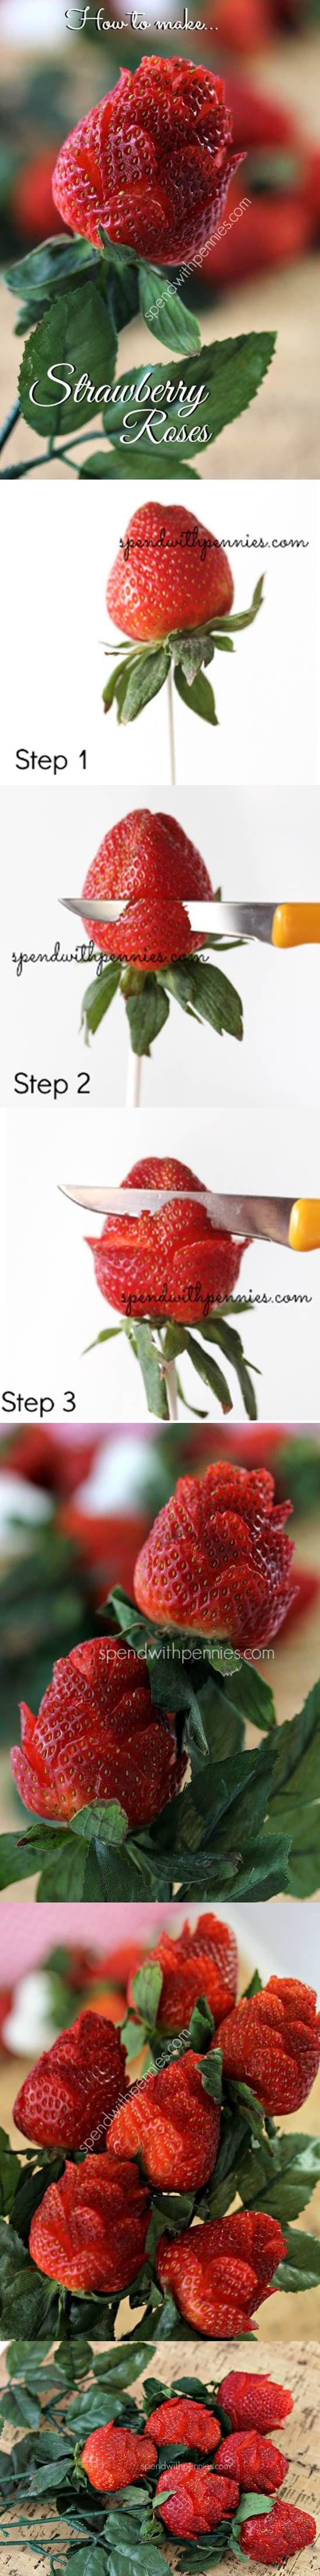 DIY Beautiful Strawberry Roses | iCreativeIdeas.com Like Us on Facebook ==> https://www.facebook.com/icreativeideas